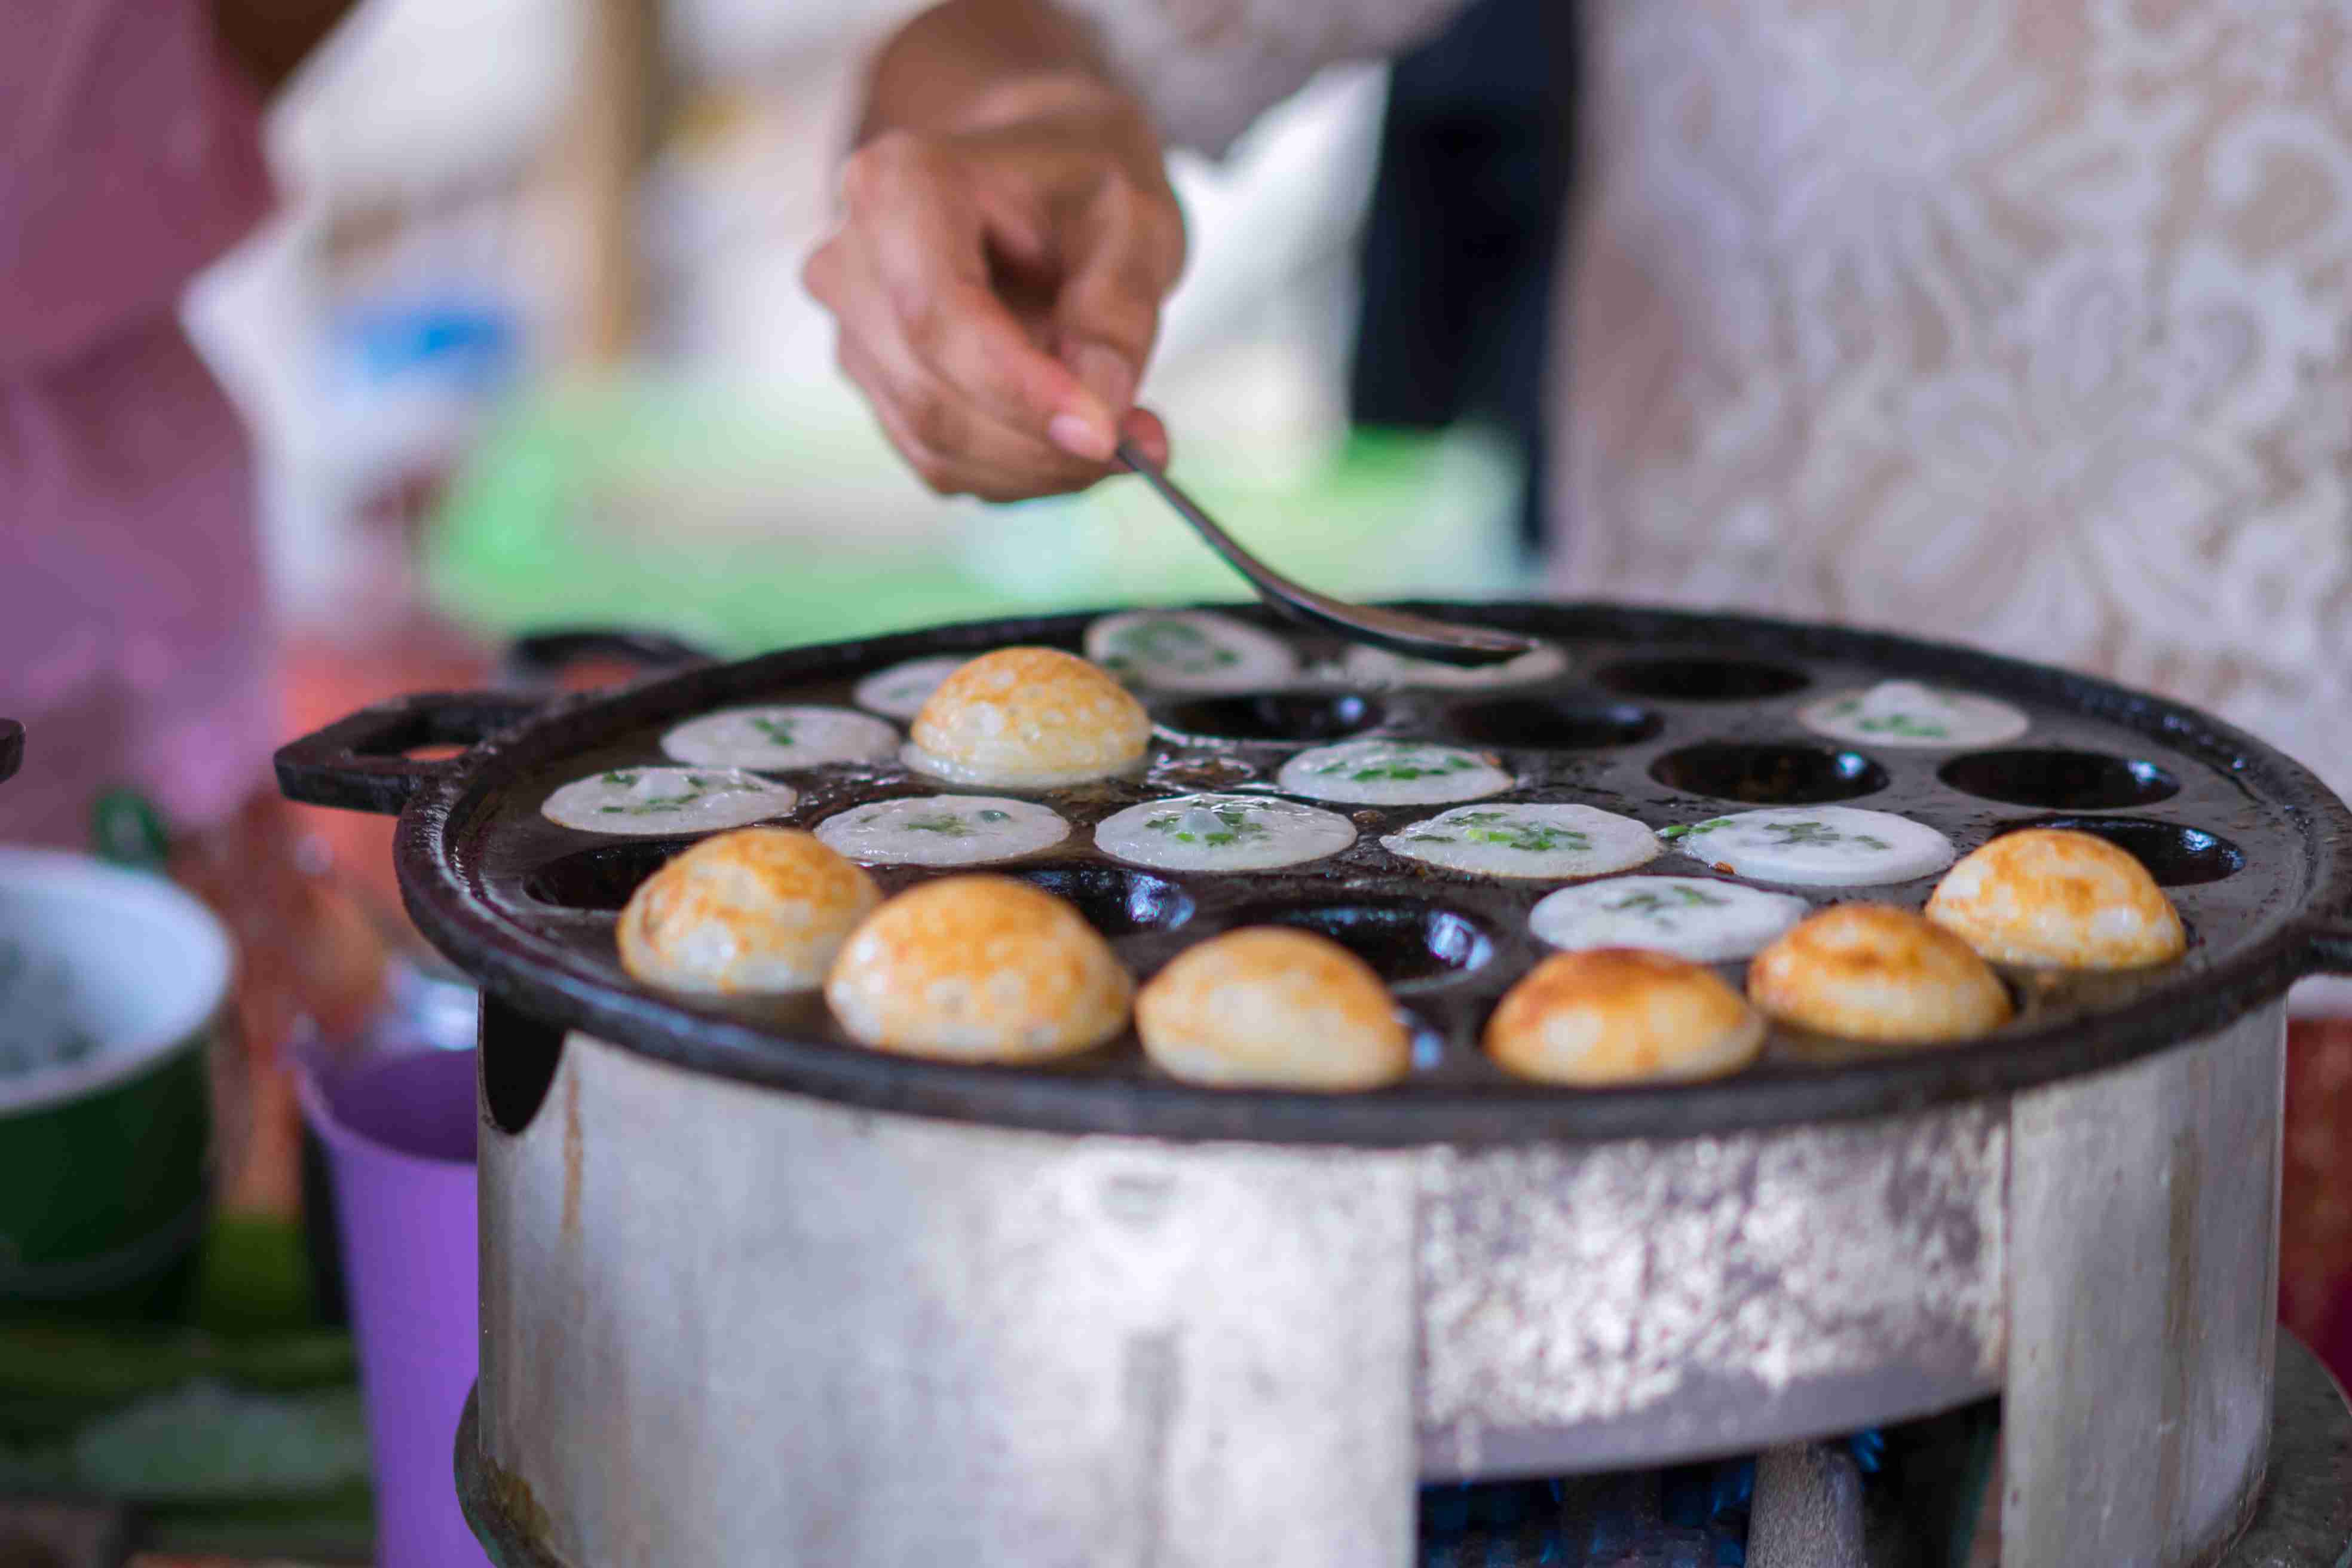 A vendor making kanom krok coconut pancakes in Thailand